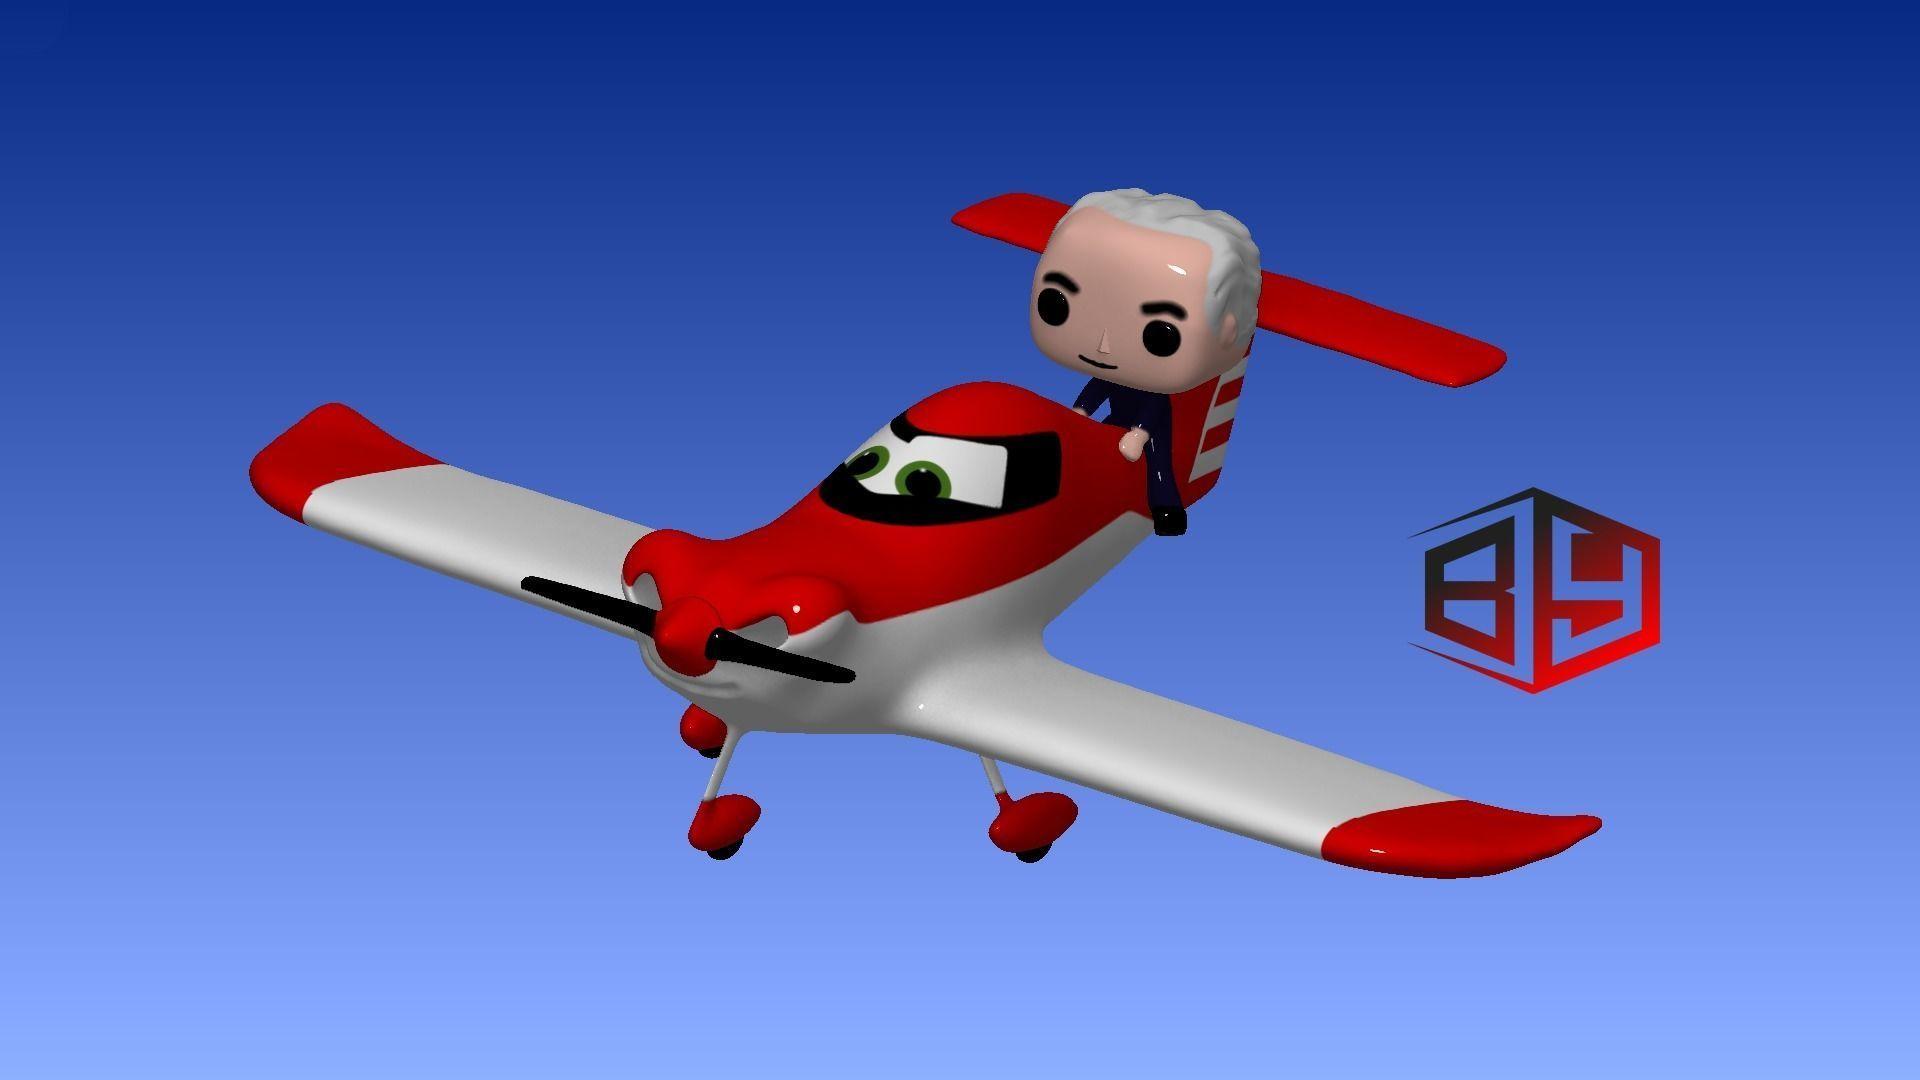 Spacek SD-1 Minisport 3D Funny Model